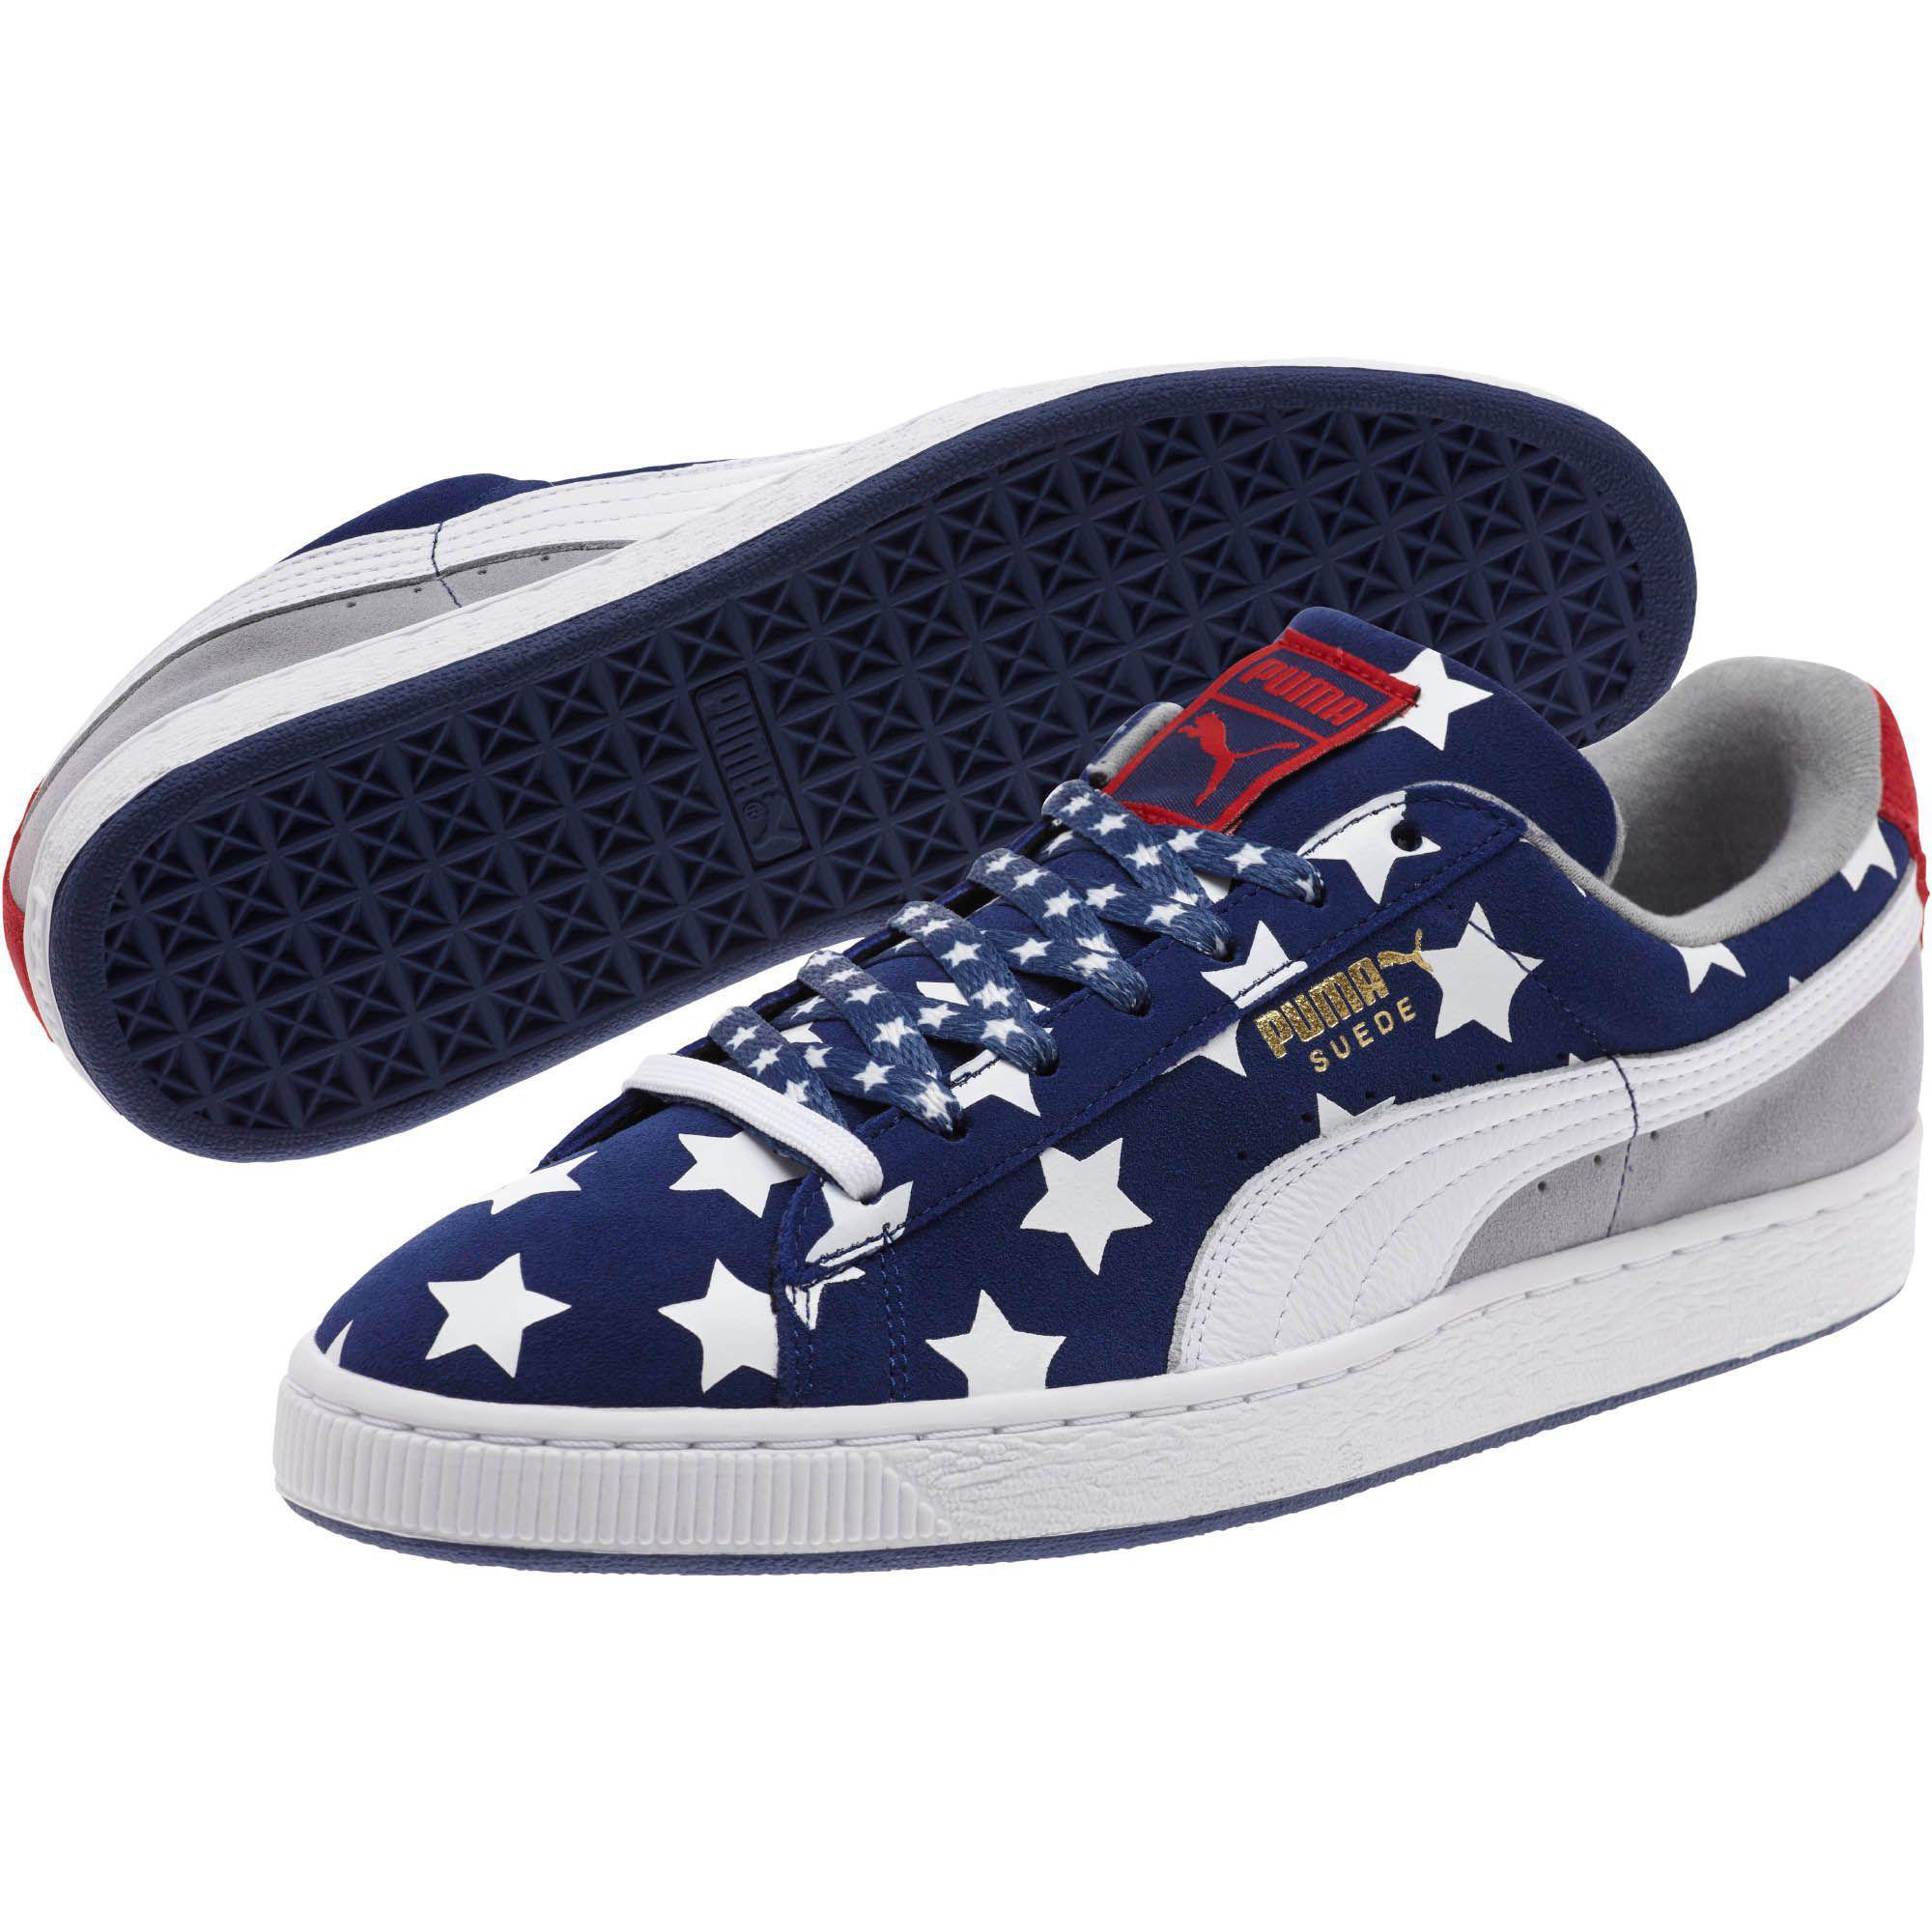 7ba3603b03e667 Lyst - PUMA Americana Suede Men s Sneakers in Brown for Men